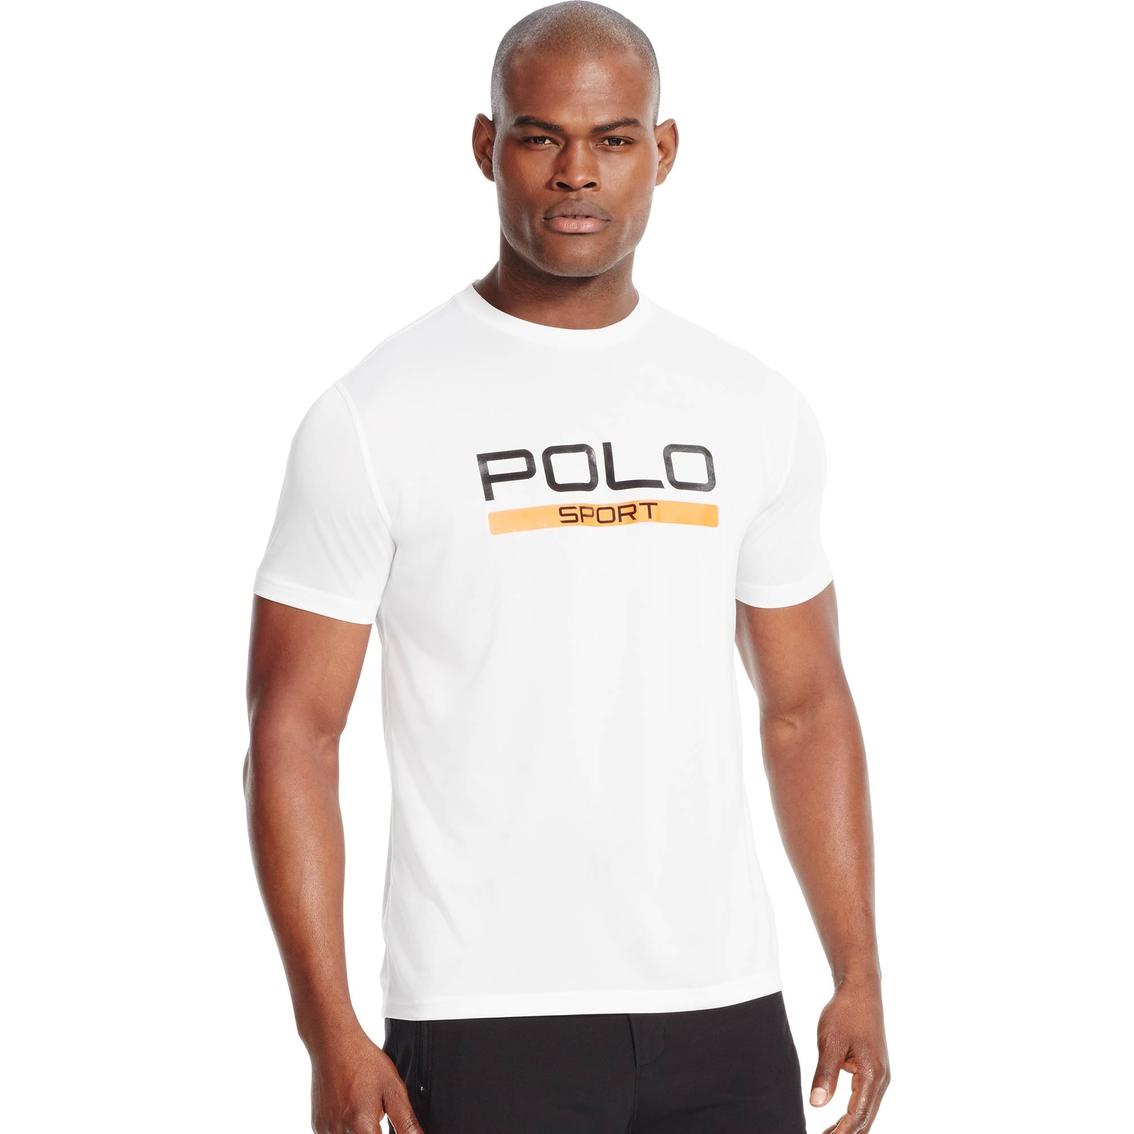 Polo Sport Performance Jersey Tee | Polo